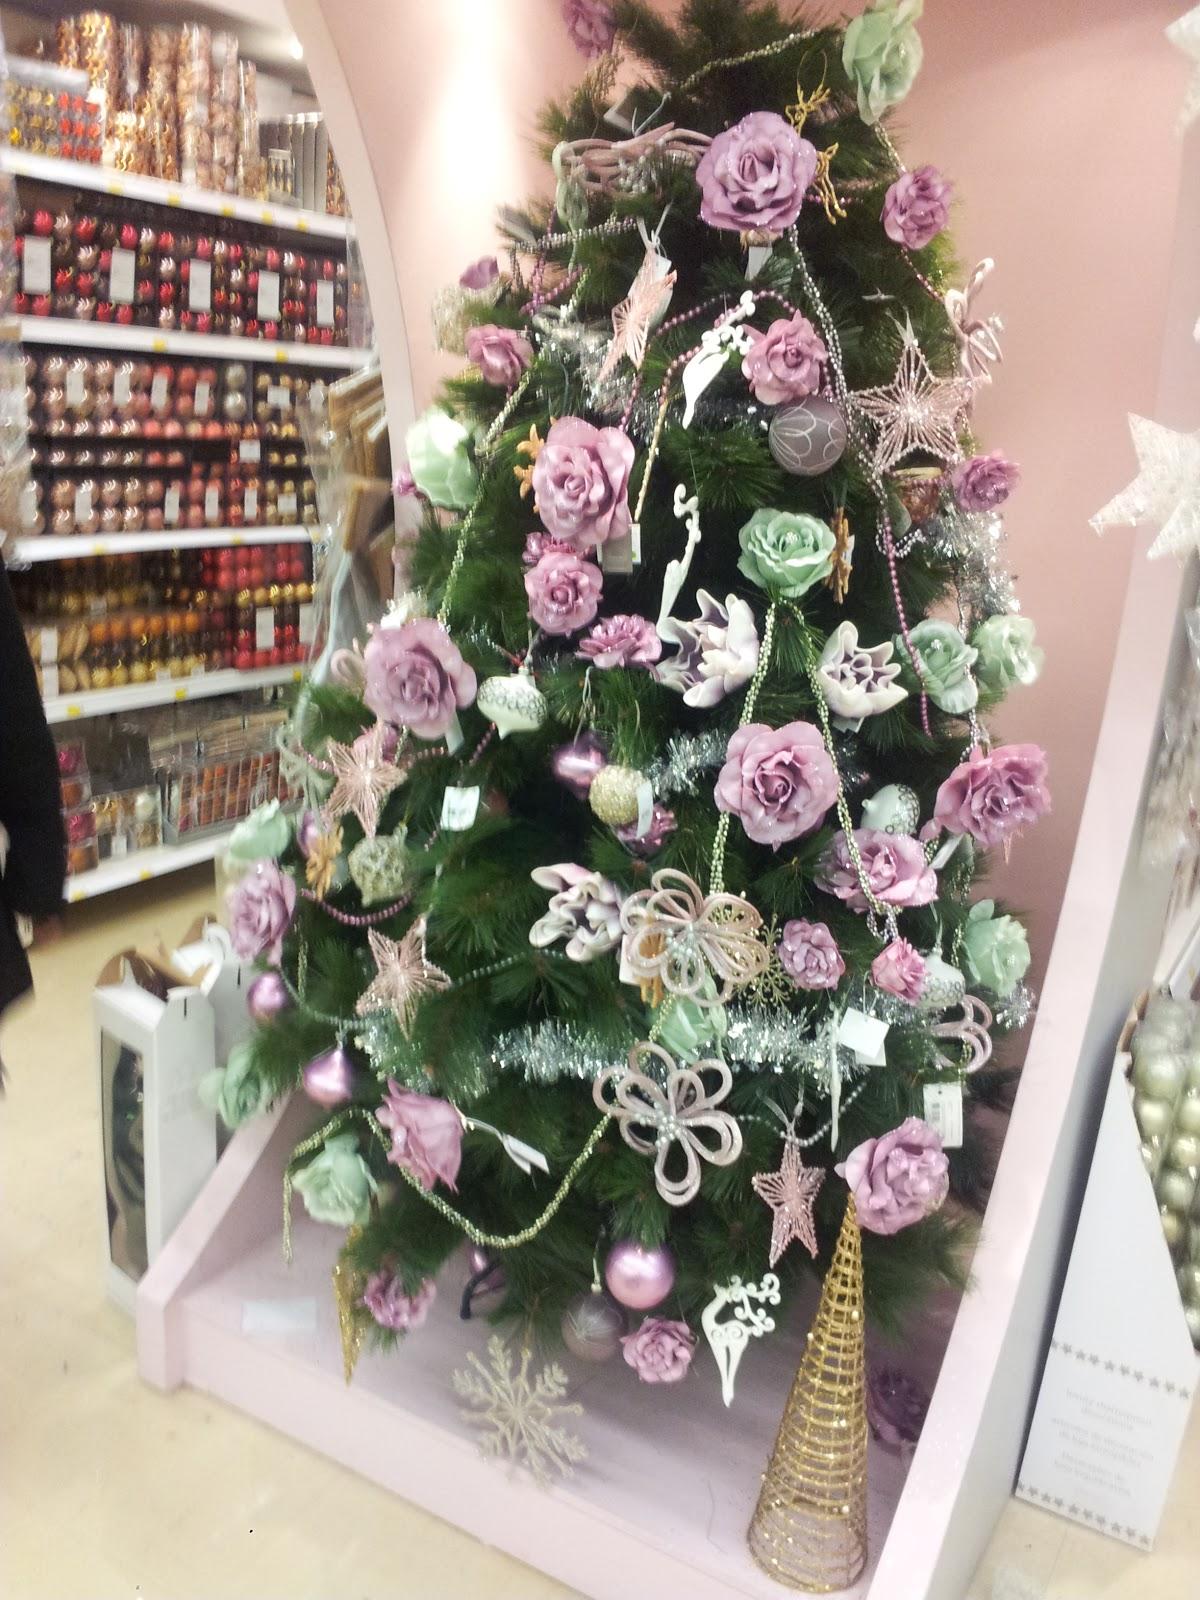 C mo no decorar un rbol de navidad mis peques y m s - Como decorar un arbol de navidad ...